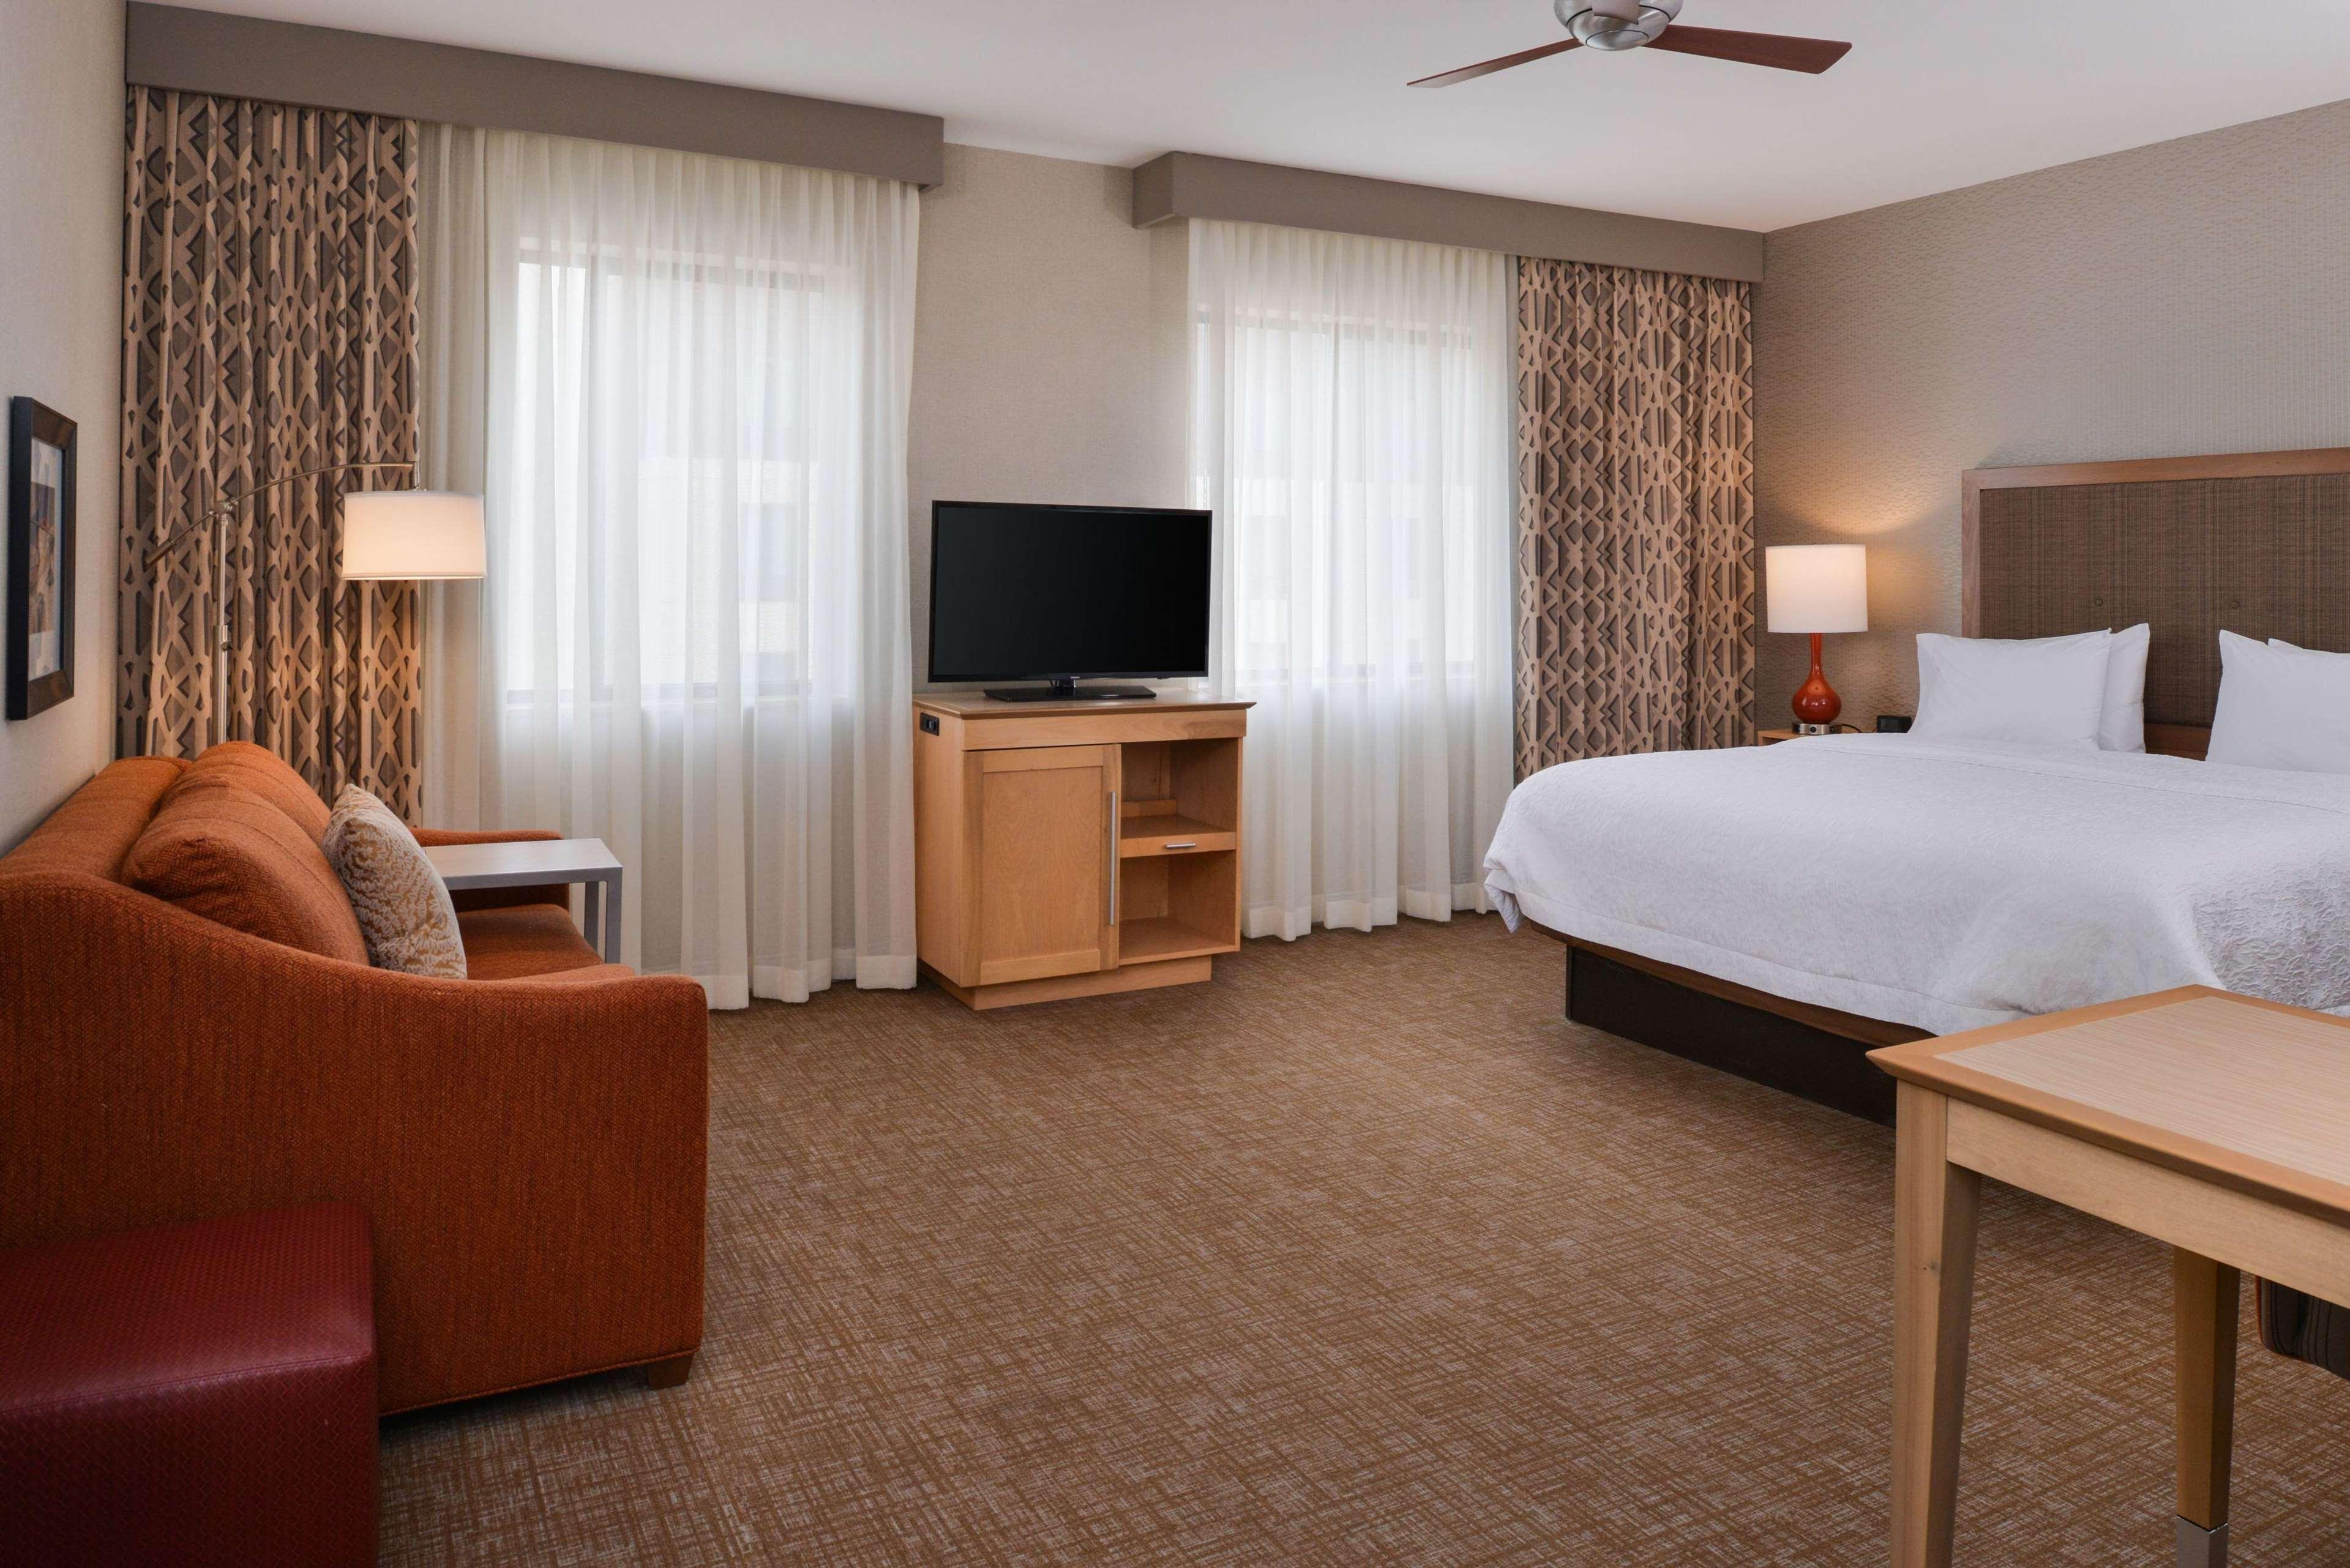 Hampton Inn & Suites Denver-Speer Boulevard image 24